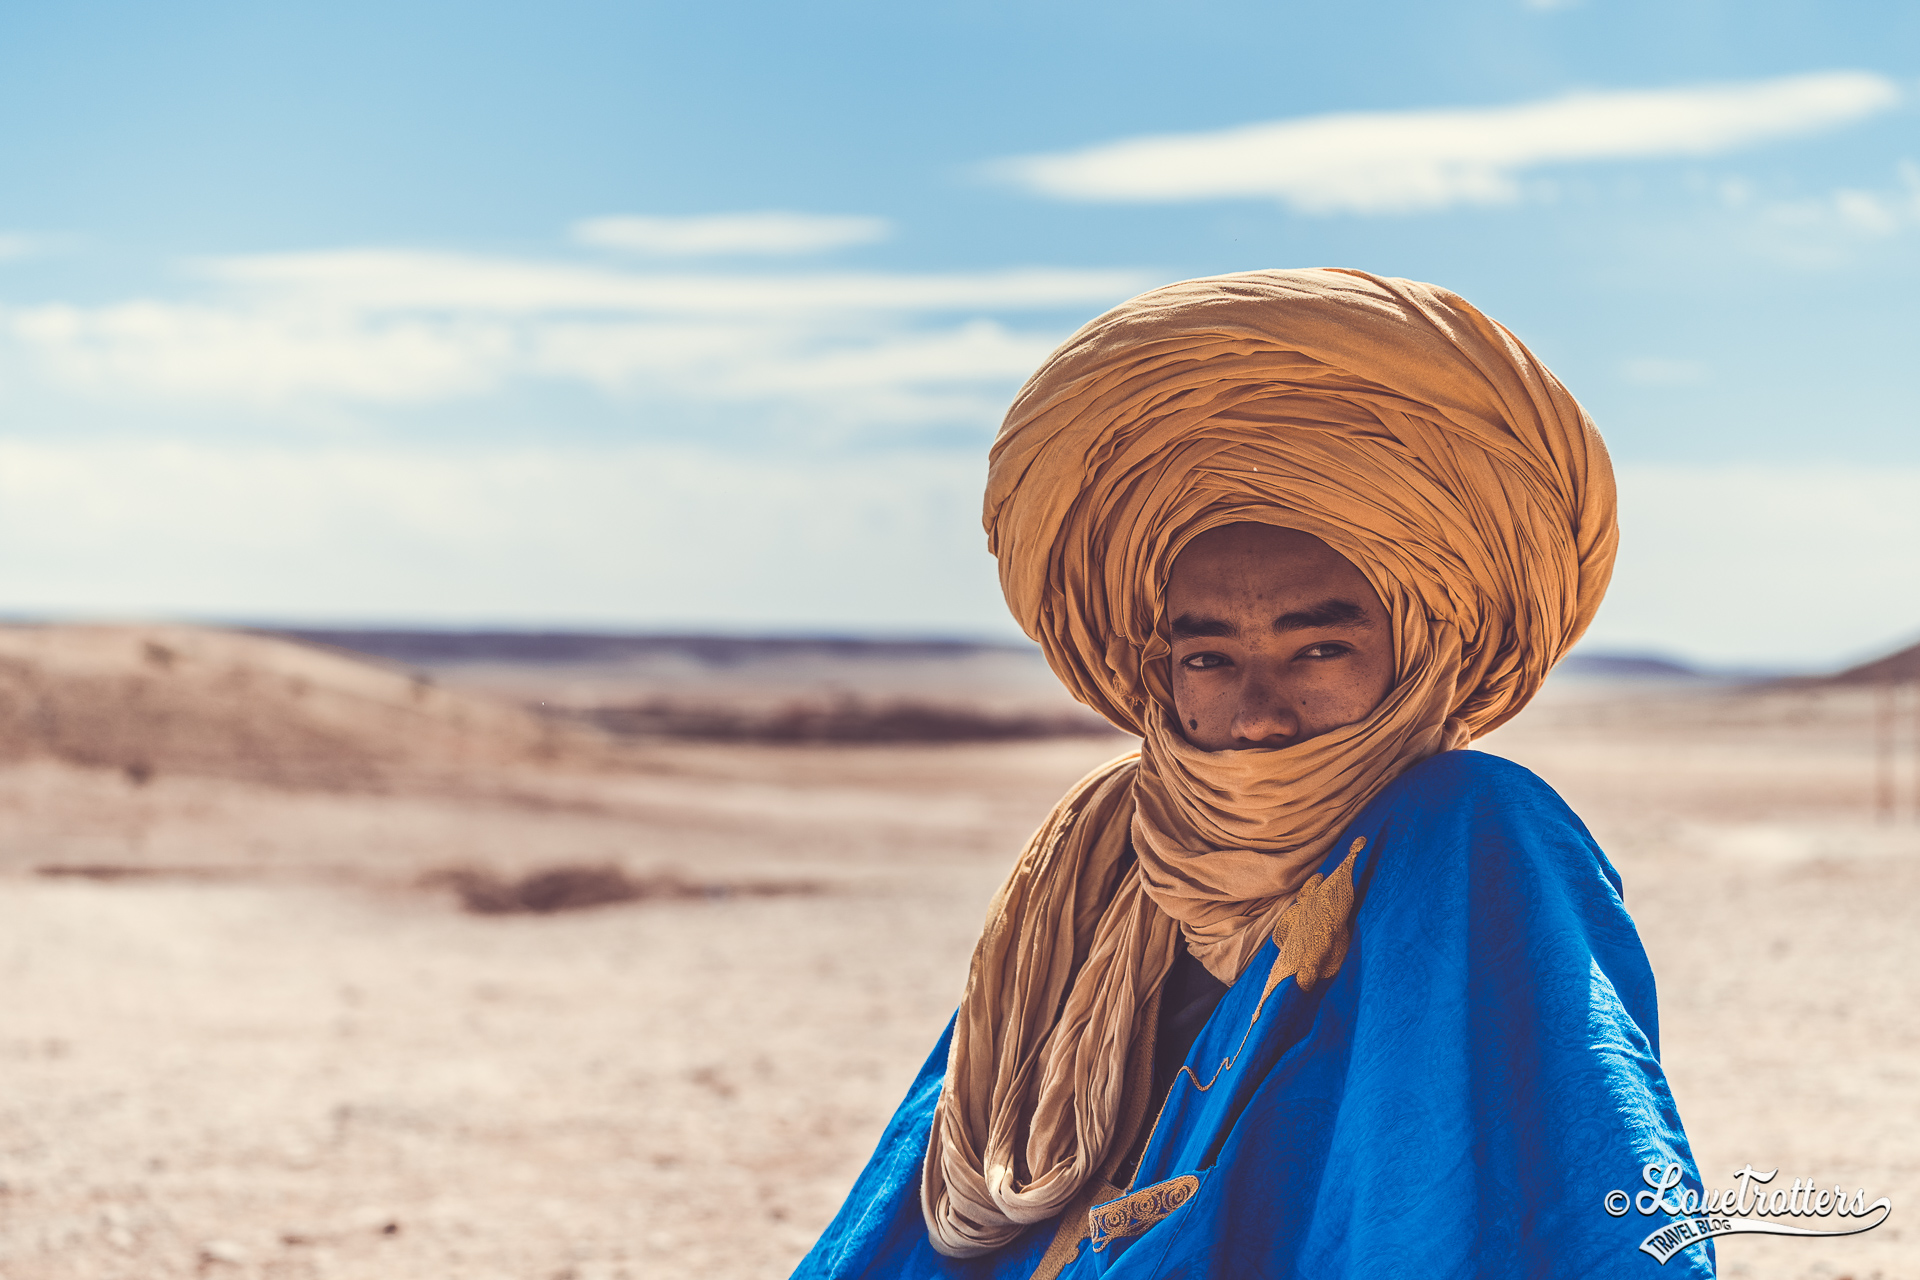 Nomade du désert du Maroc